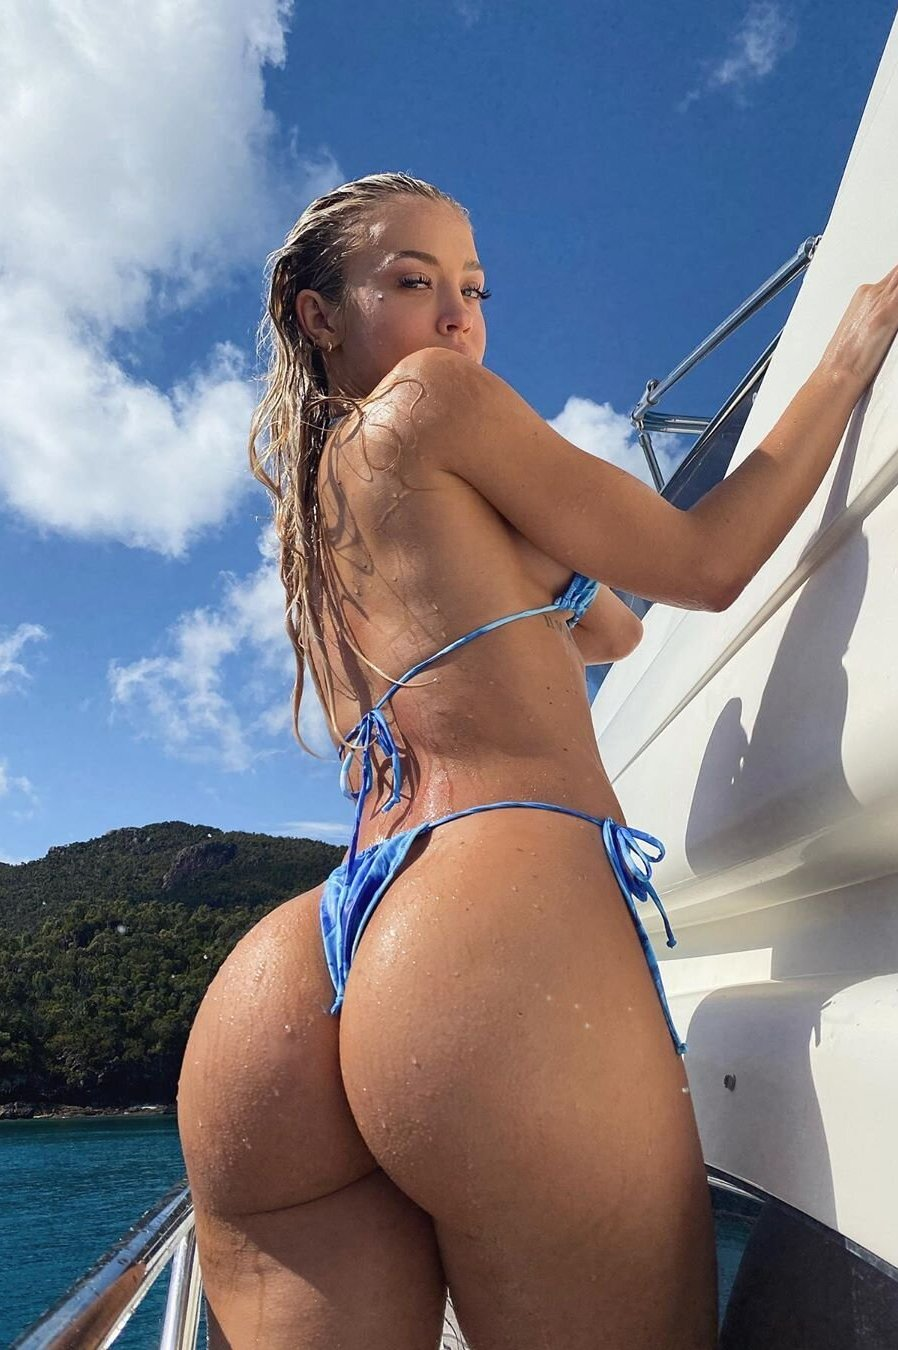 Hot girl wet big ass Groovy Girl With Wet Big Ass In Sexy Bikini Bottom Pandesia World